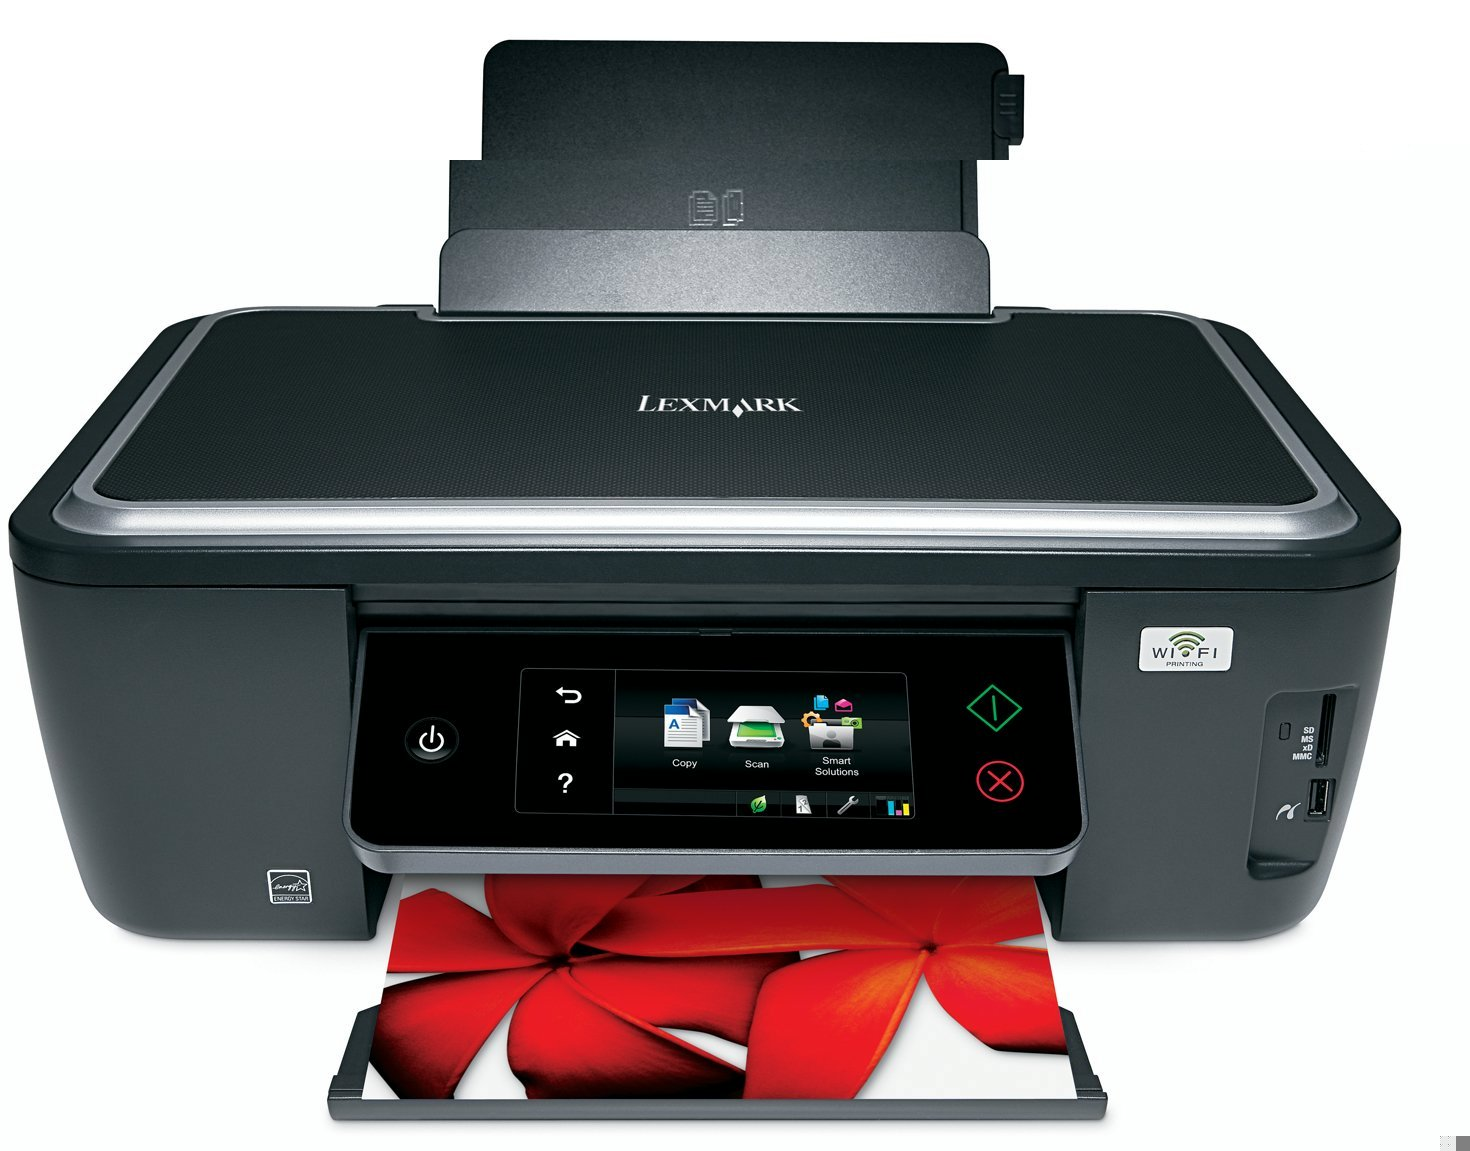 lexmark s605 printer driver